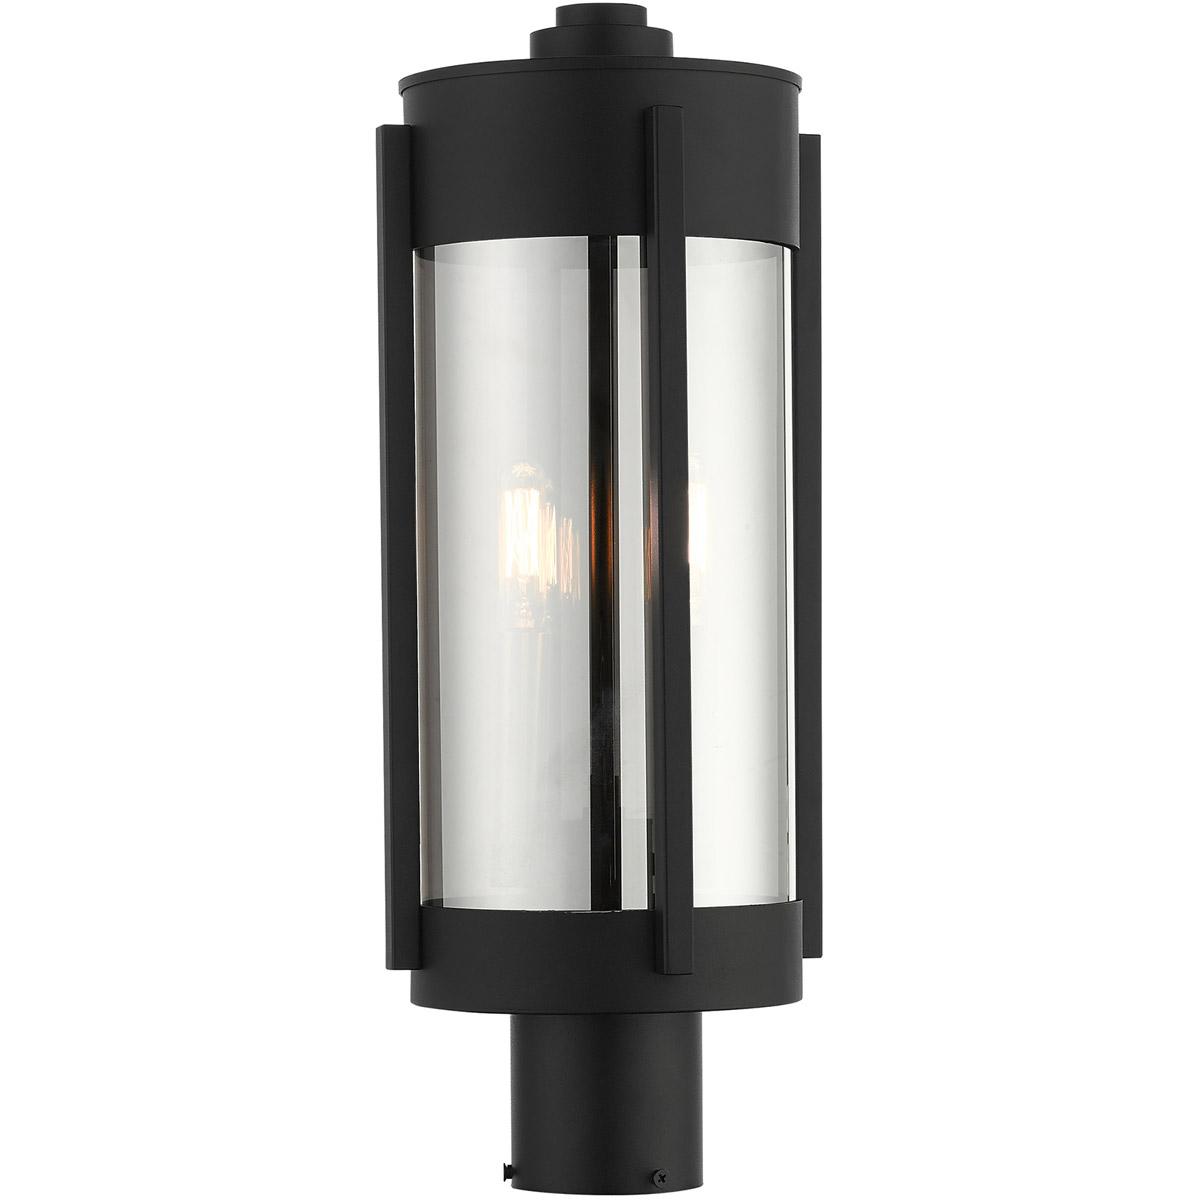 Livex 22386 04 Sheridan Post Light Or Accessories Ebay